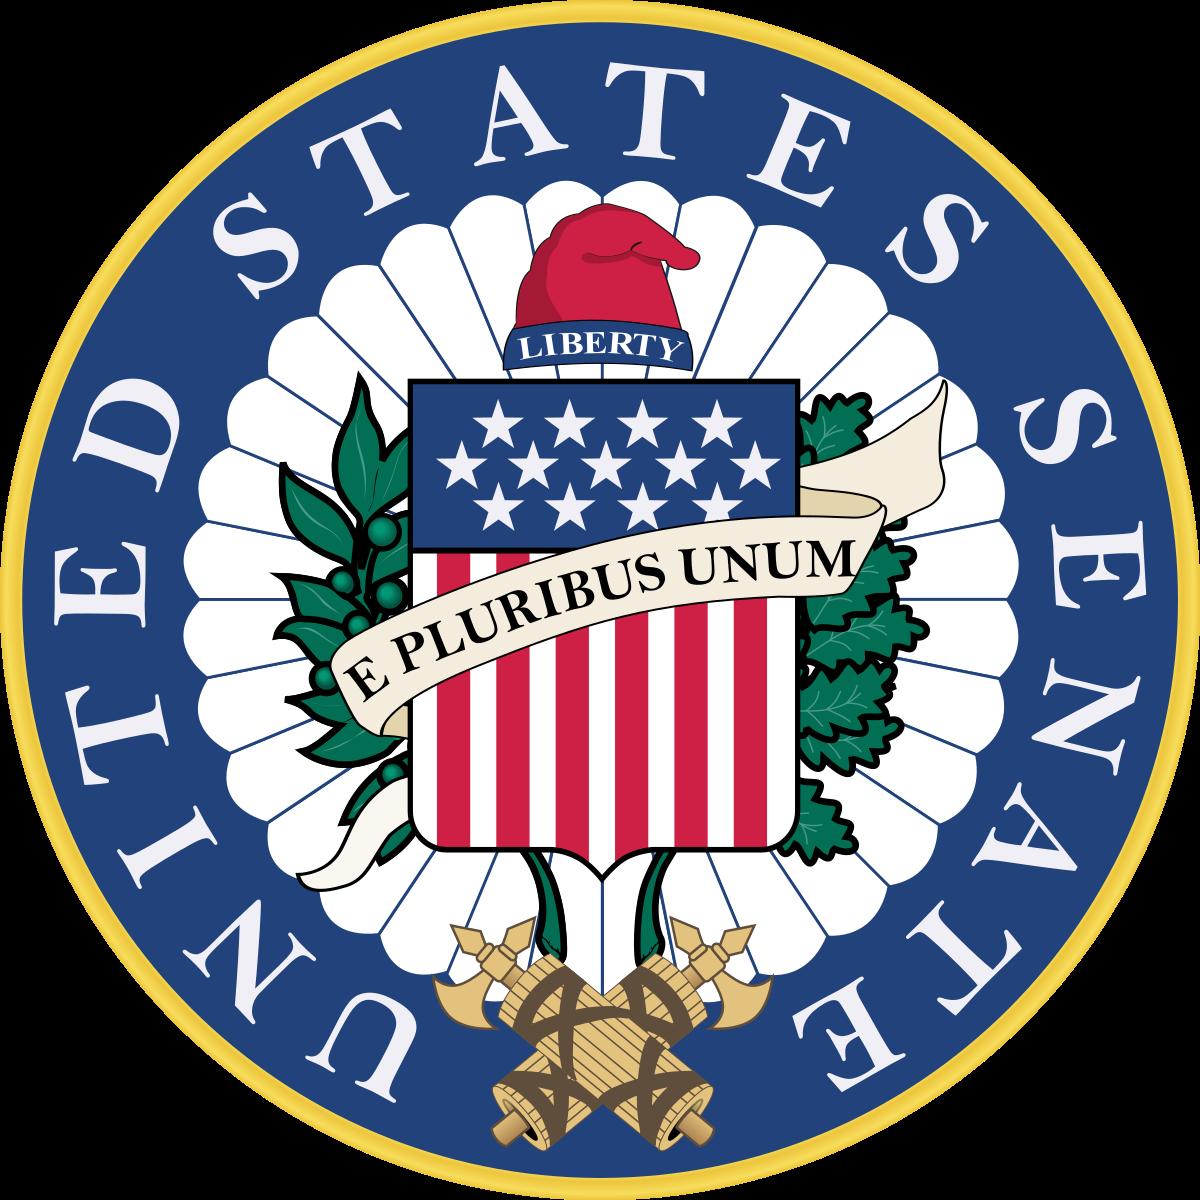 Leader clipart majority leader. United states senate wikipedia